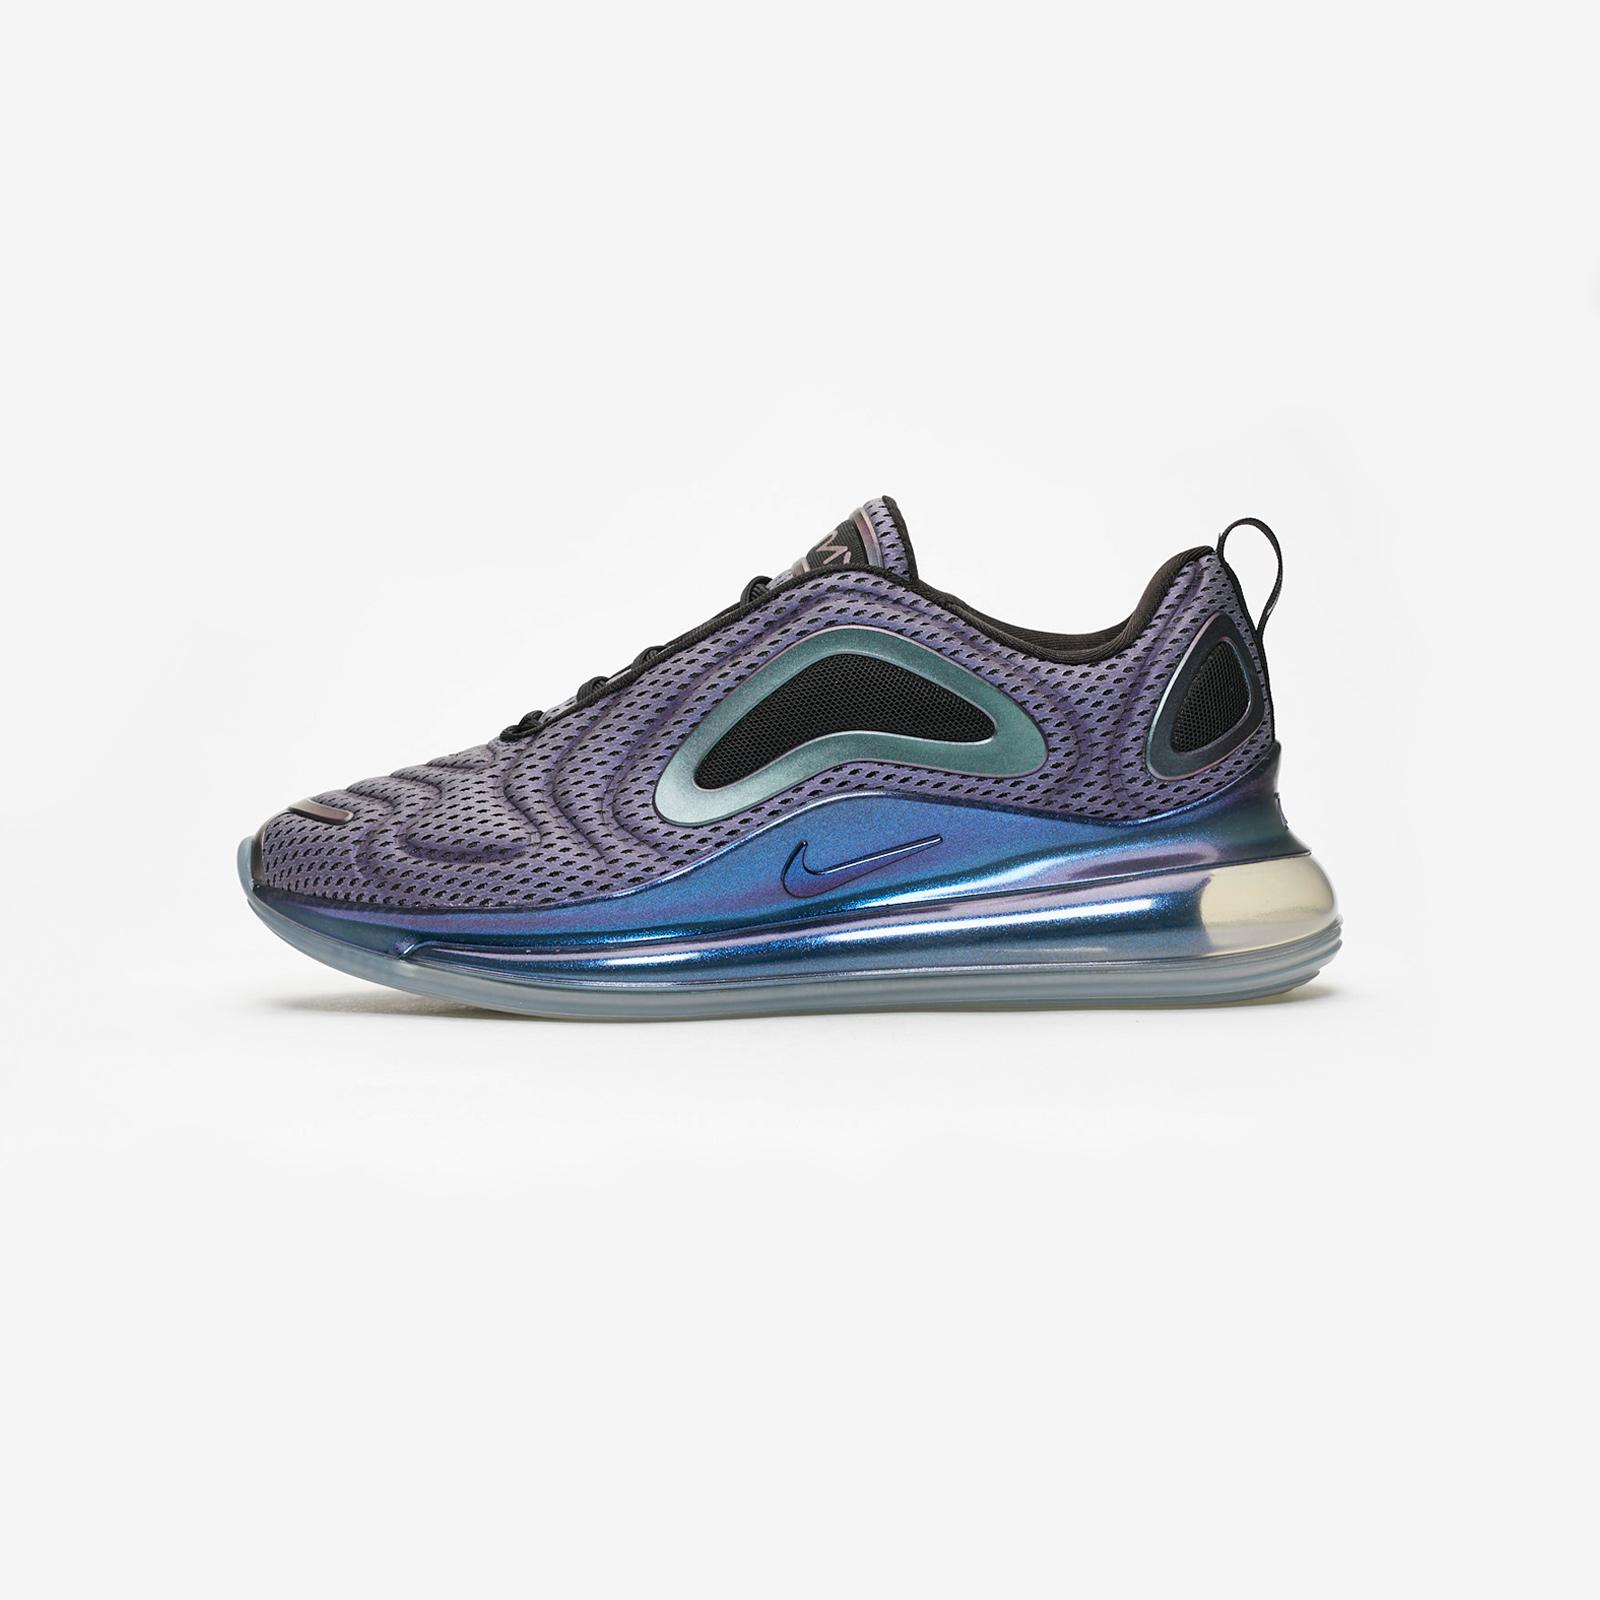 Nike AIR MAX 720 AO2924 001 Size 45 EU: